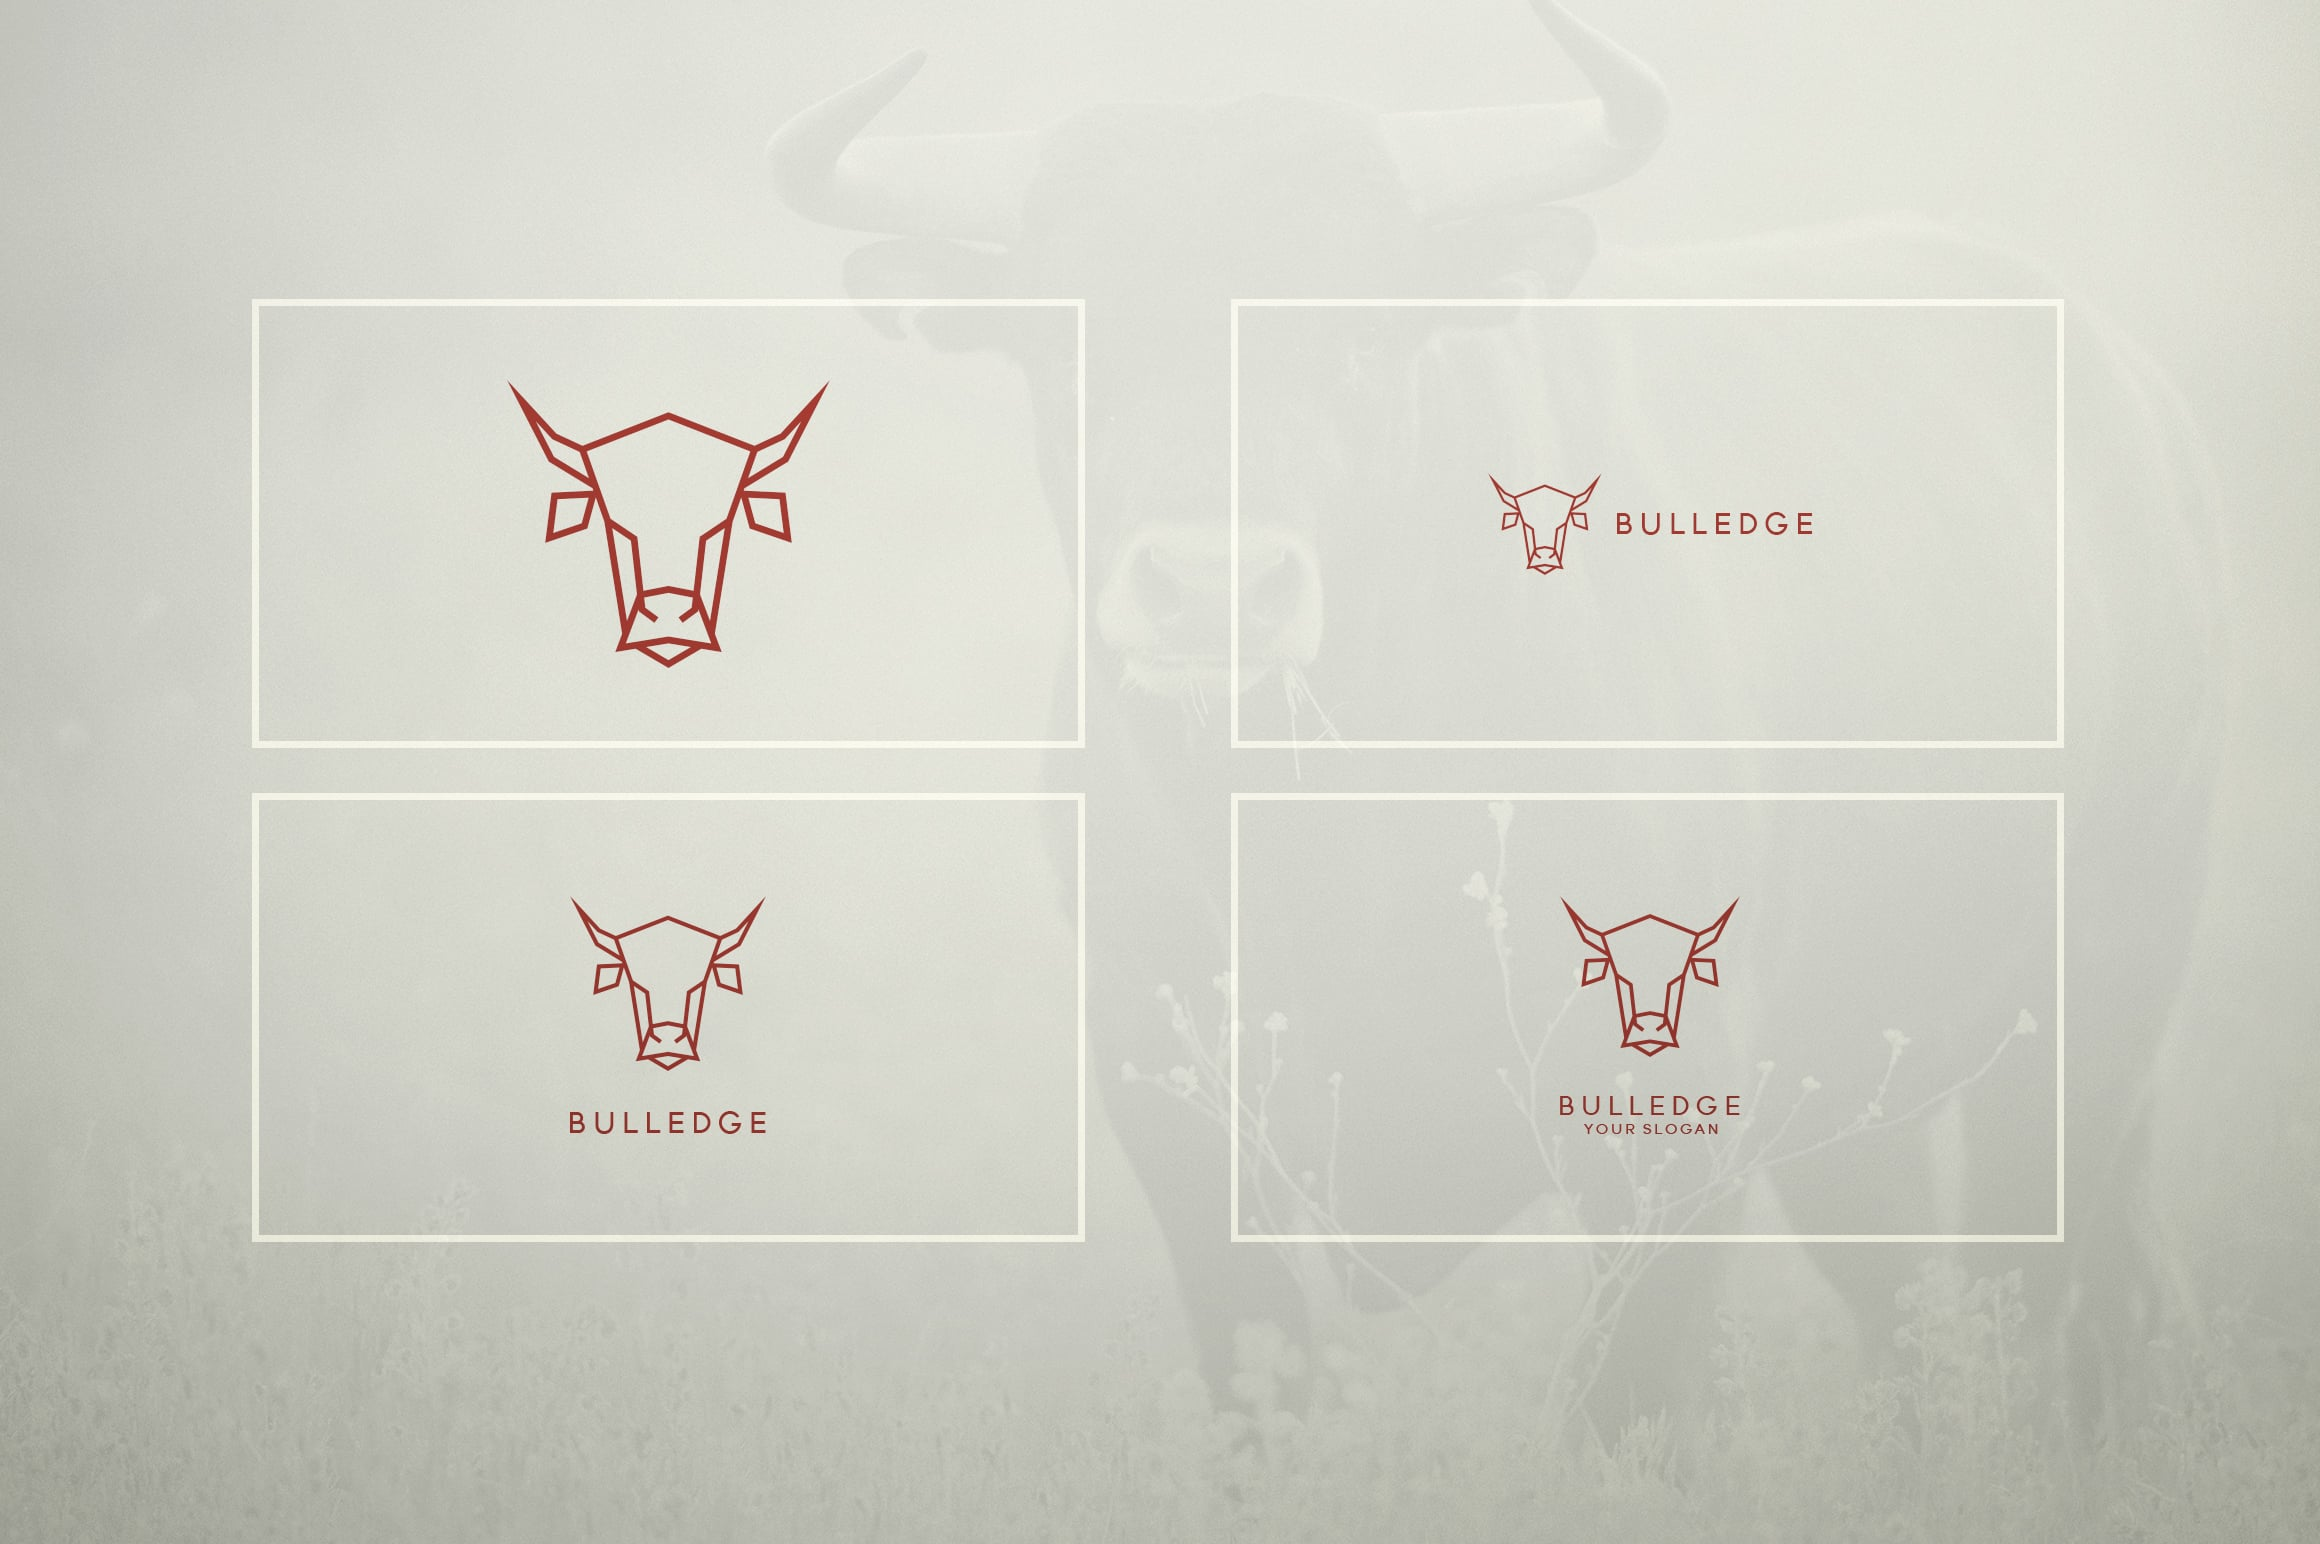 17 Geometric Animal Icons and Logos - 10